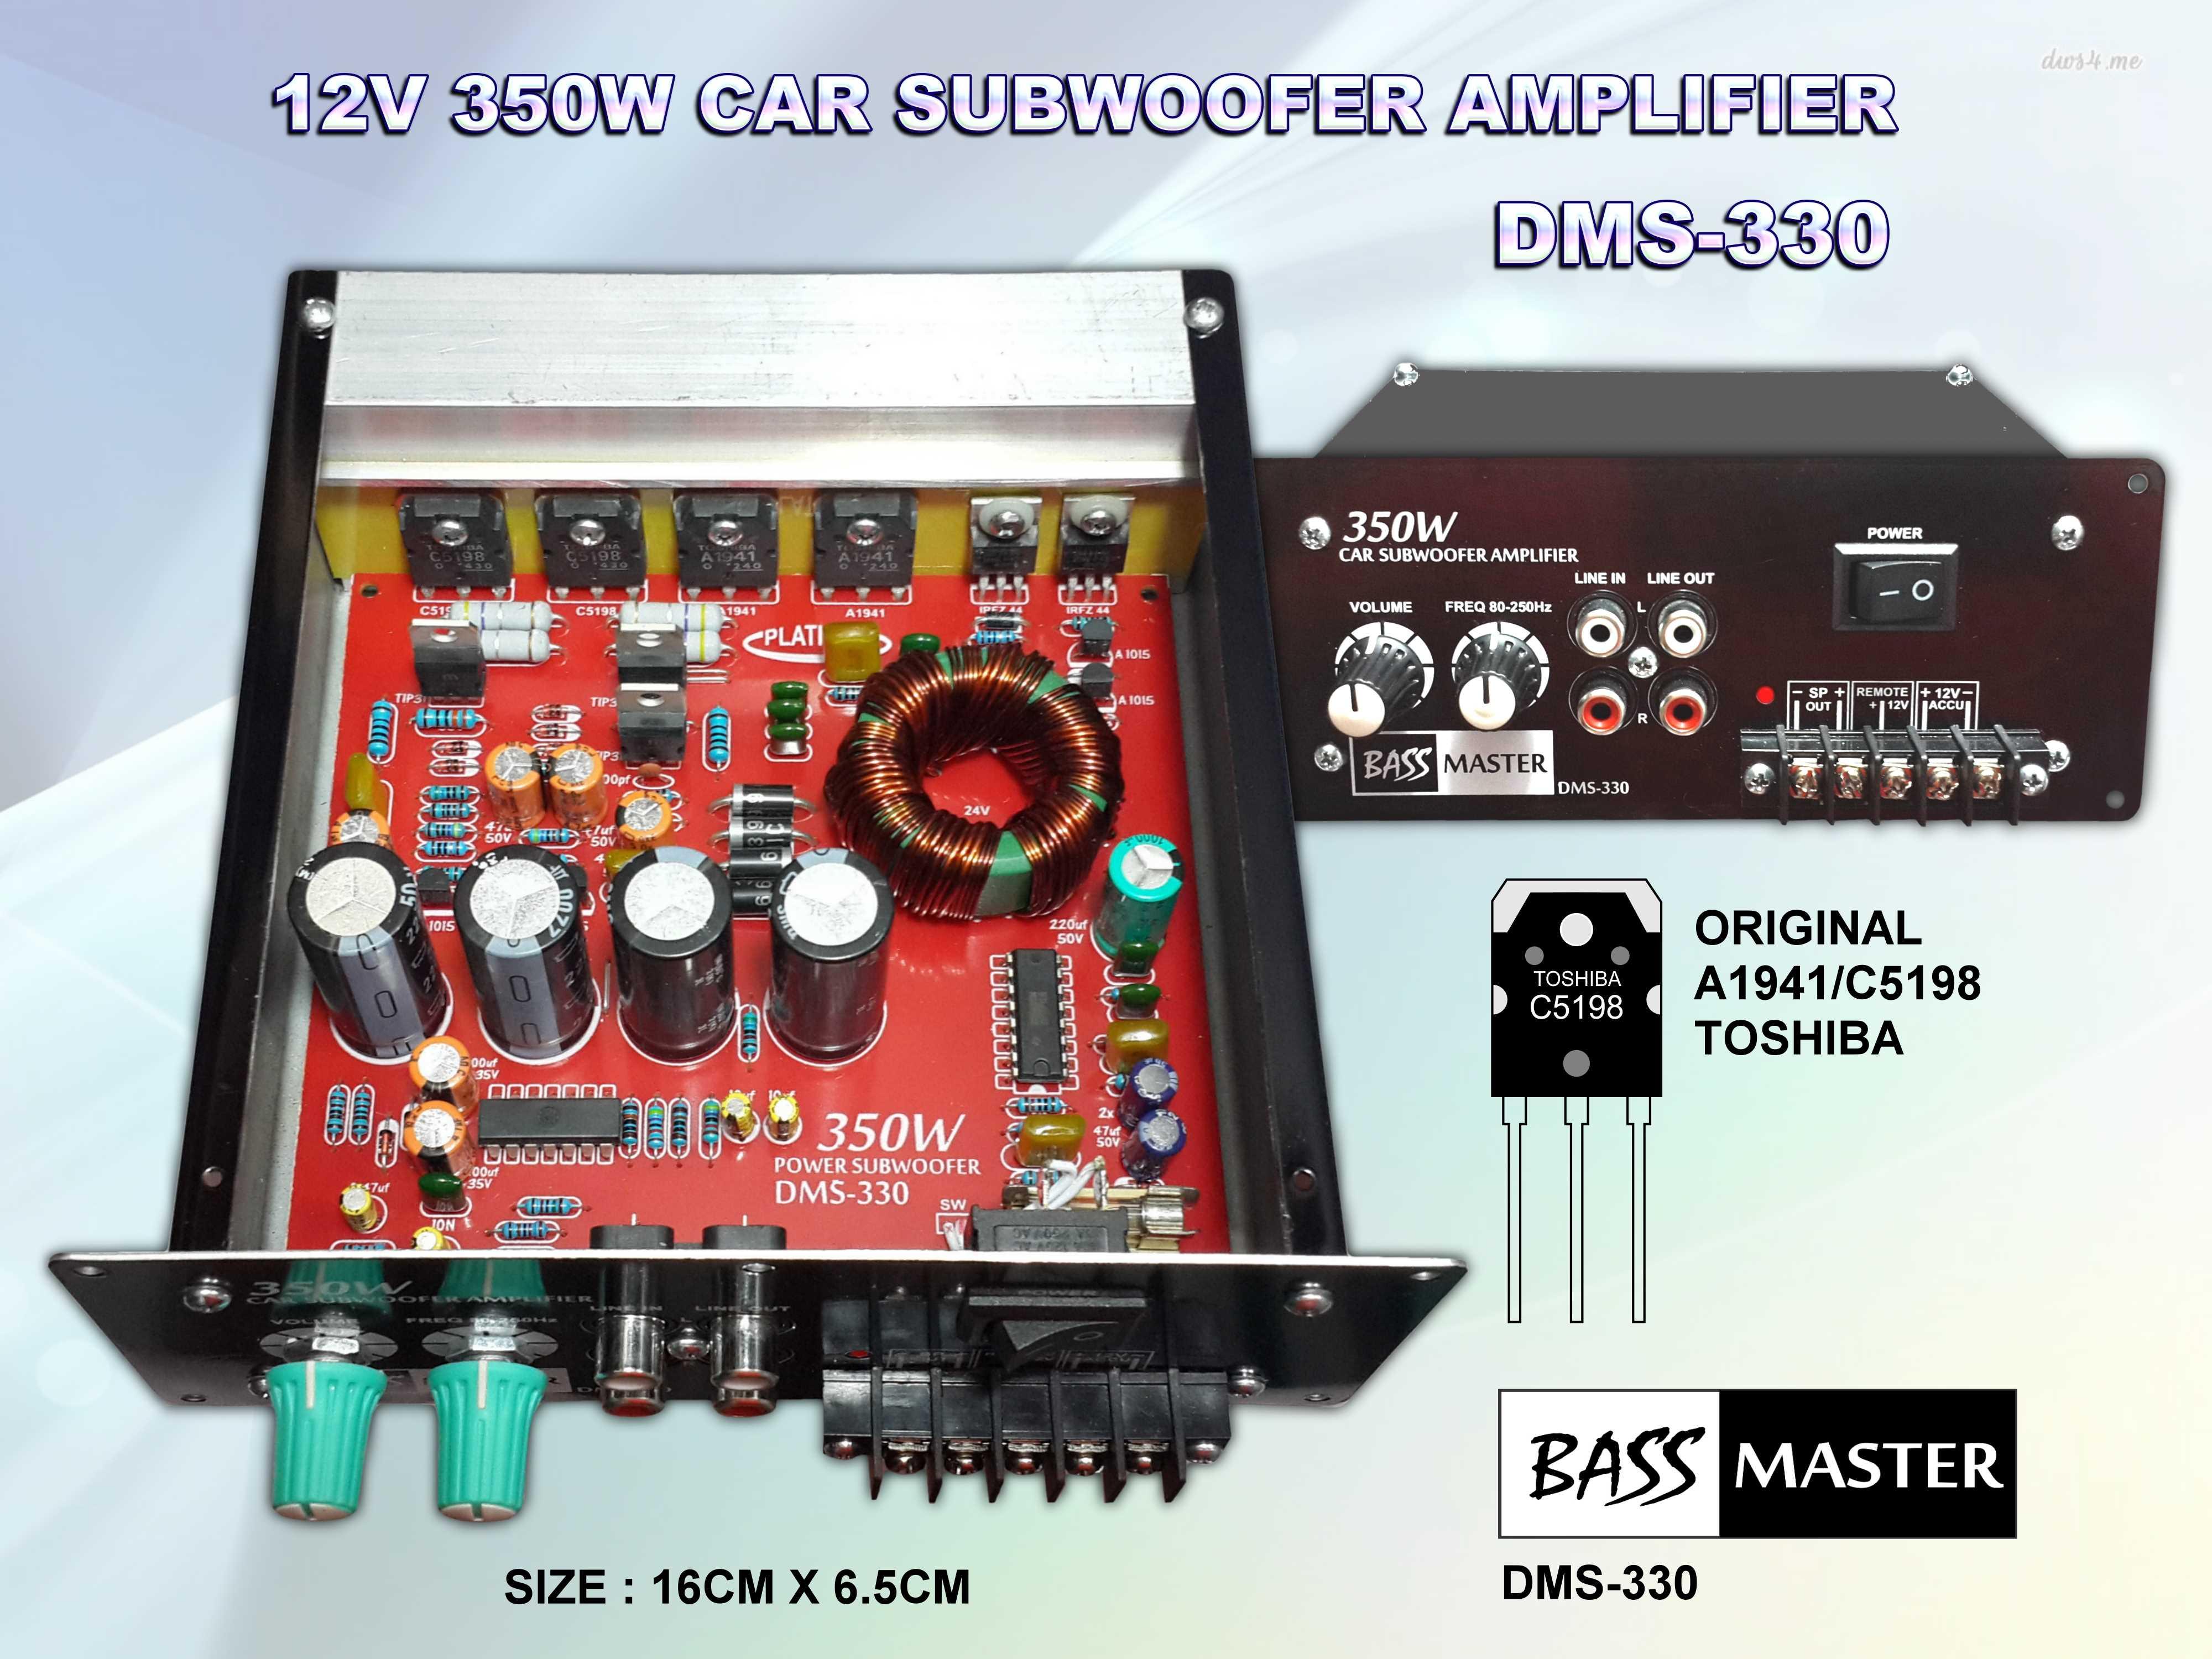 Kit Amplifier Mobil | Audiobbm.com Let's Do It